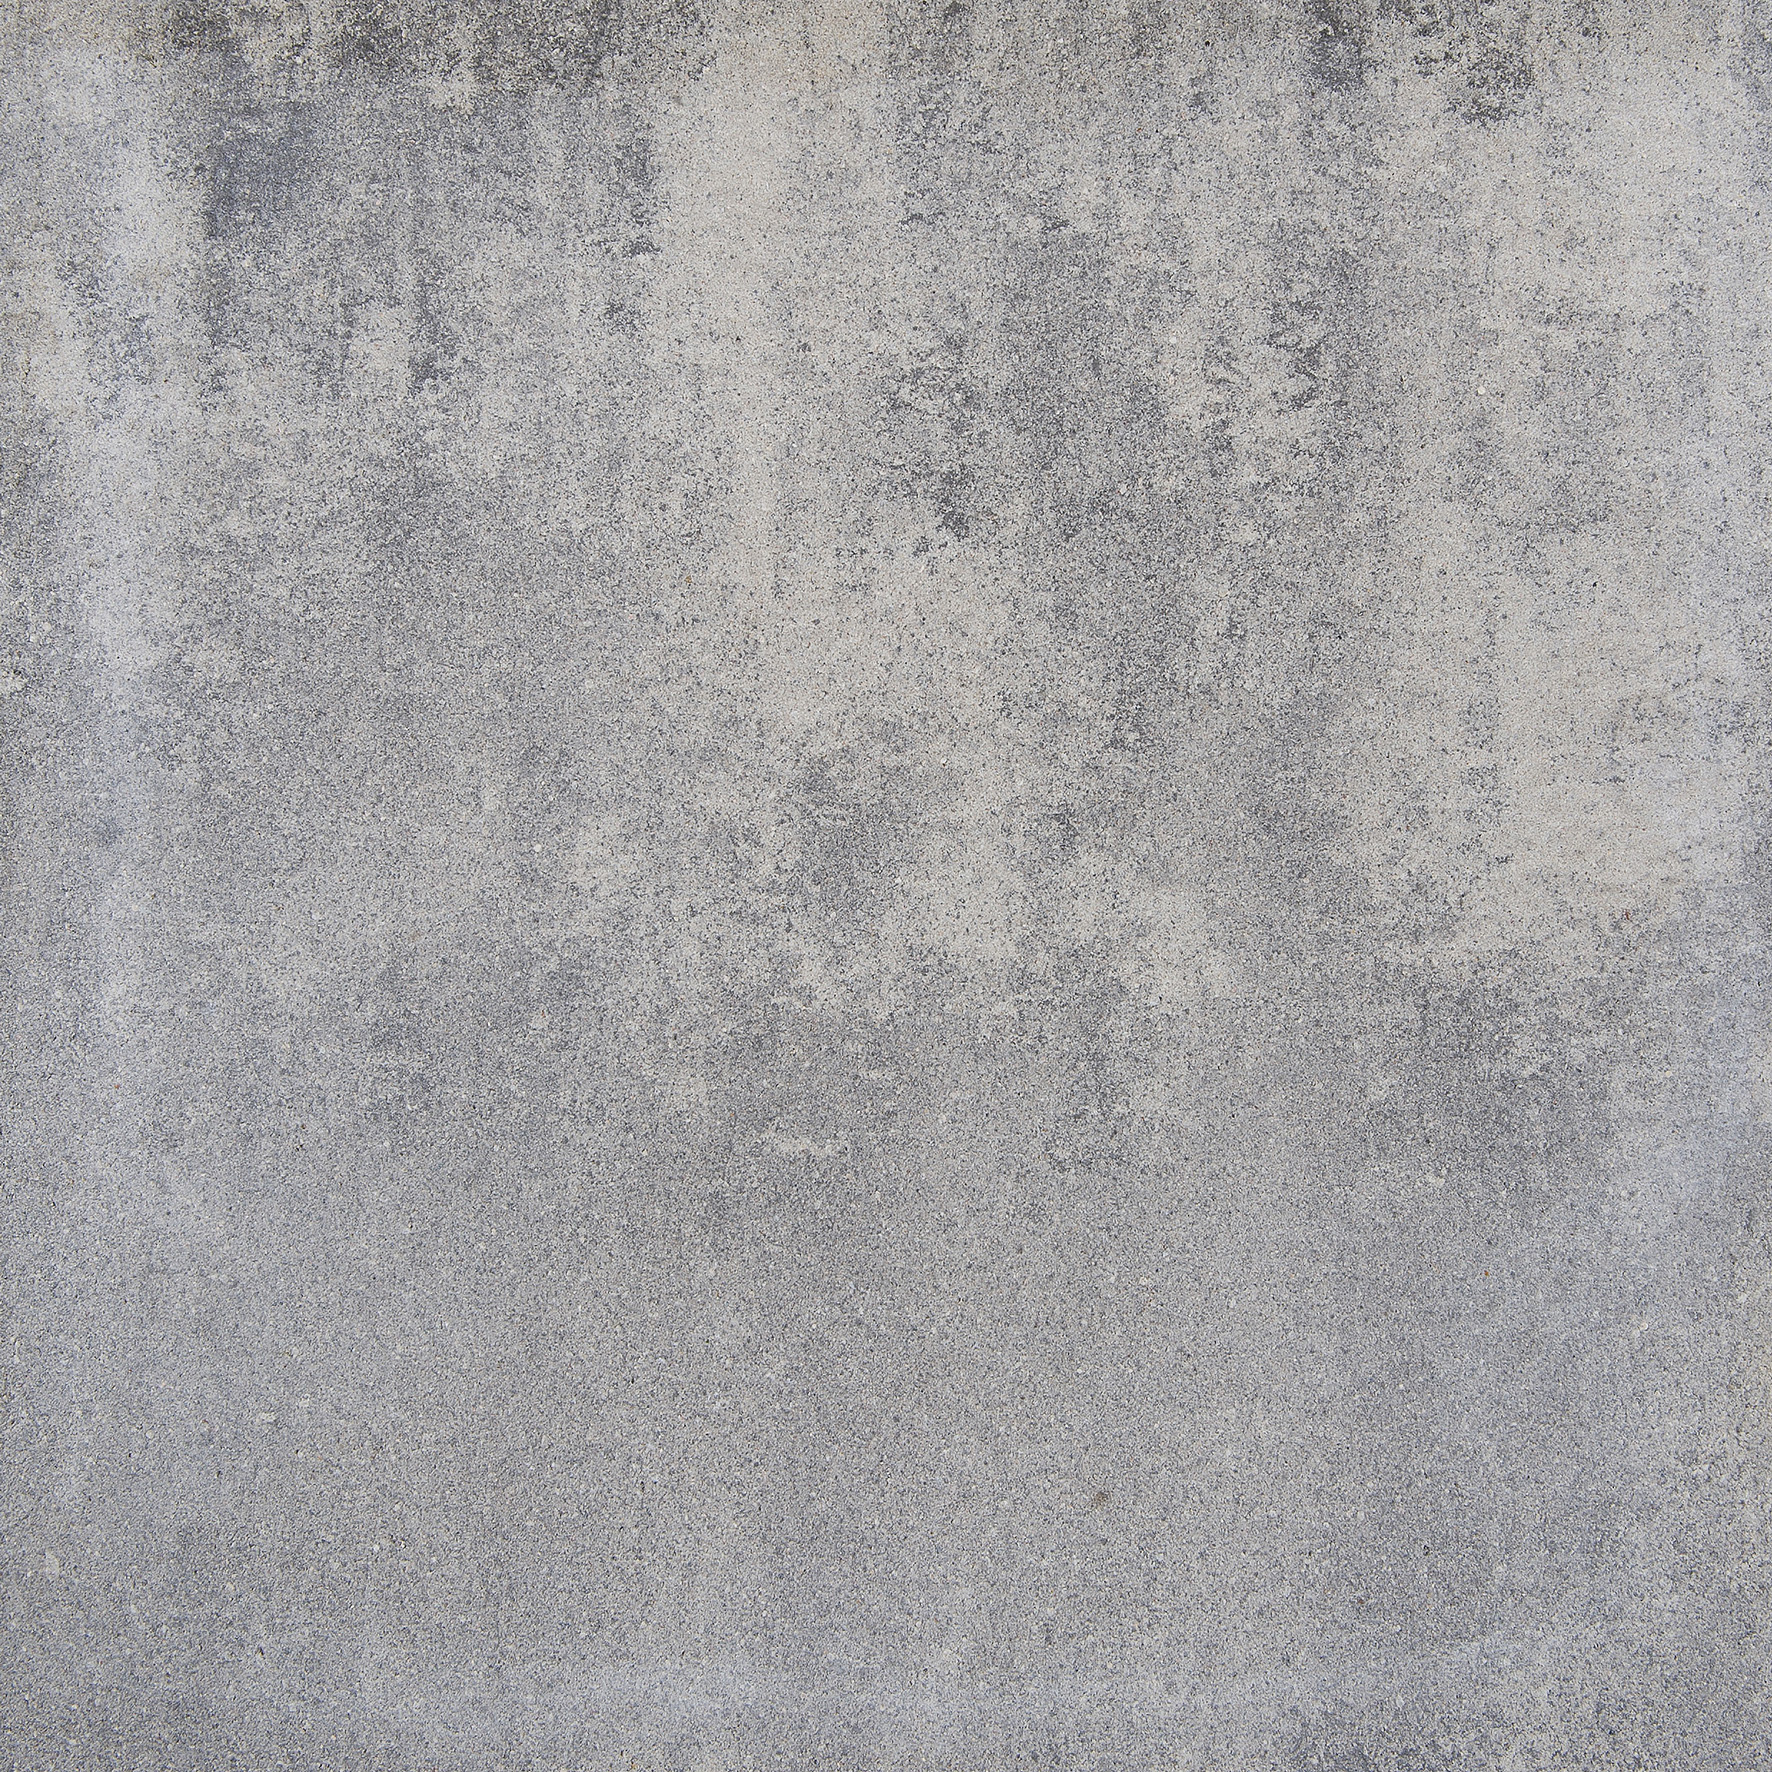 Gardenlux | Fortress Tiles 30x60x6 | Sark